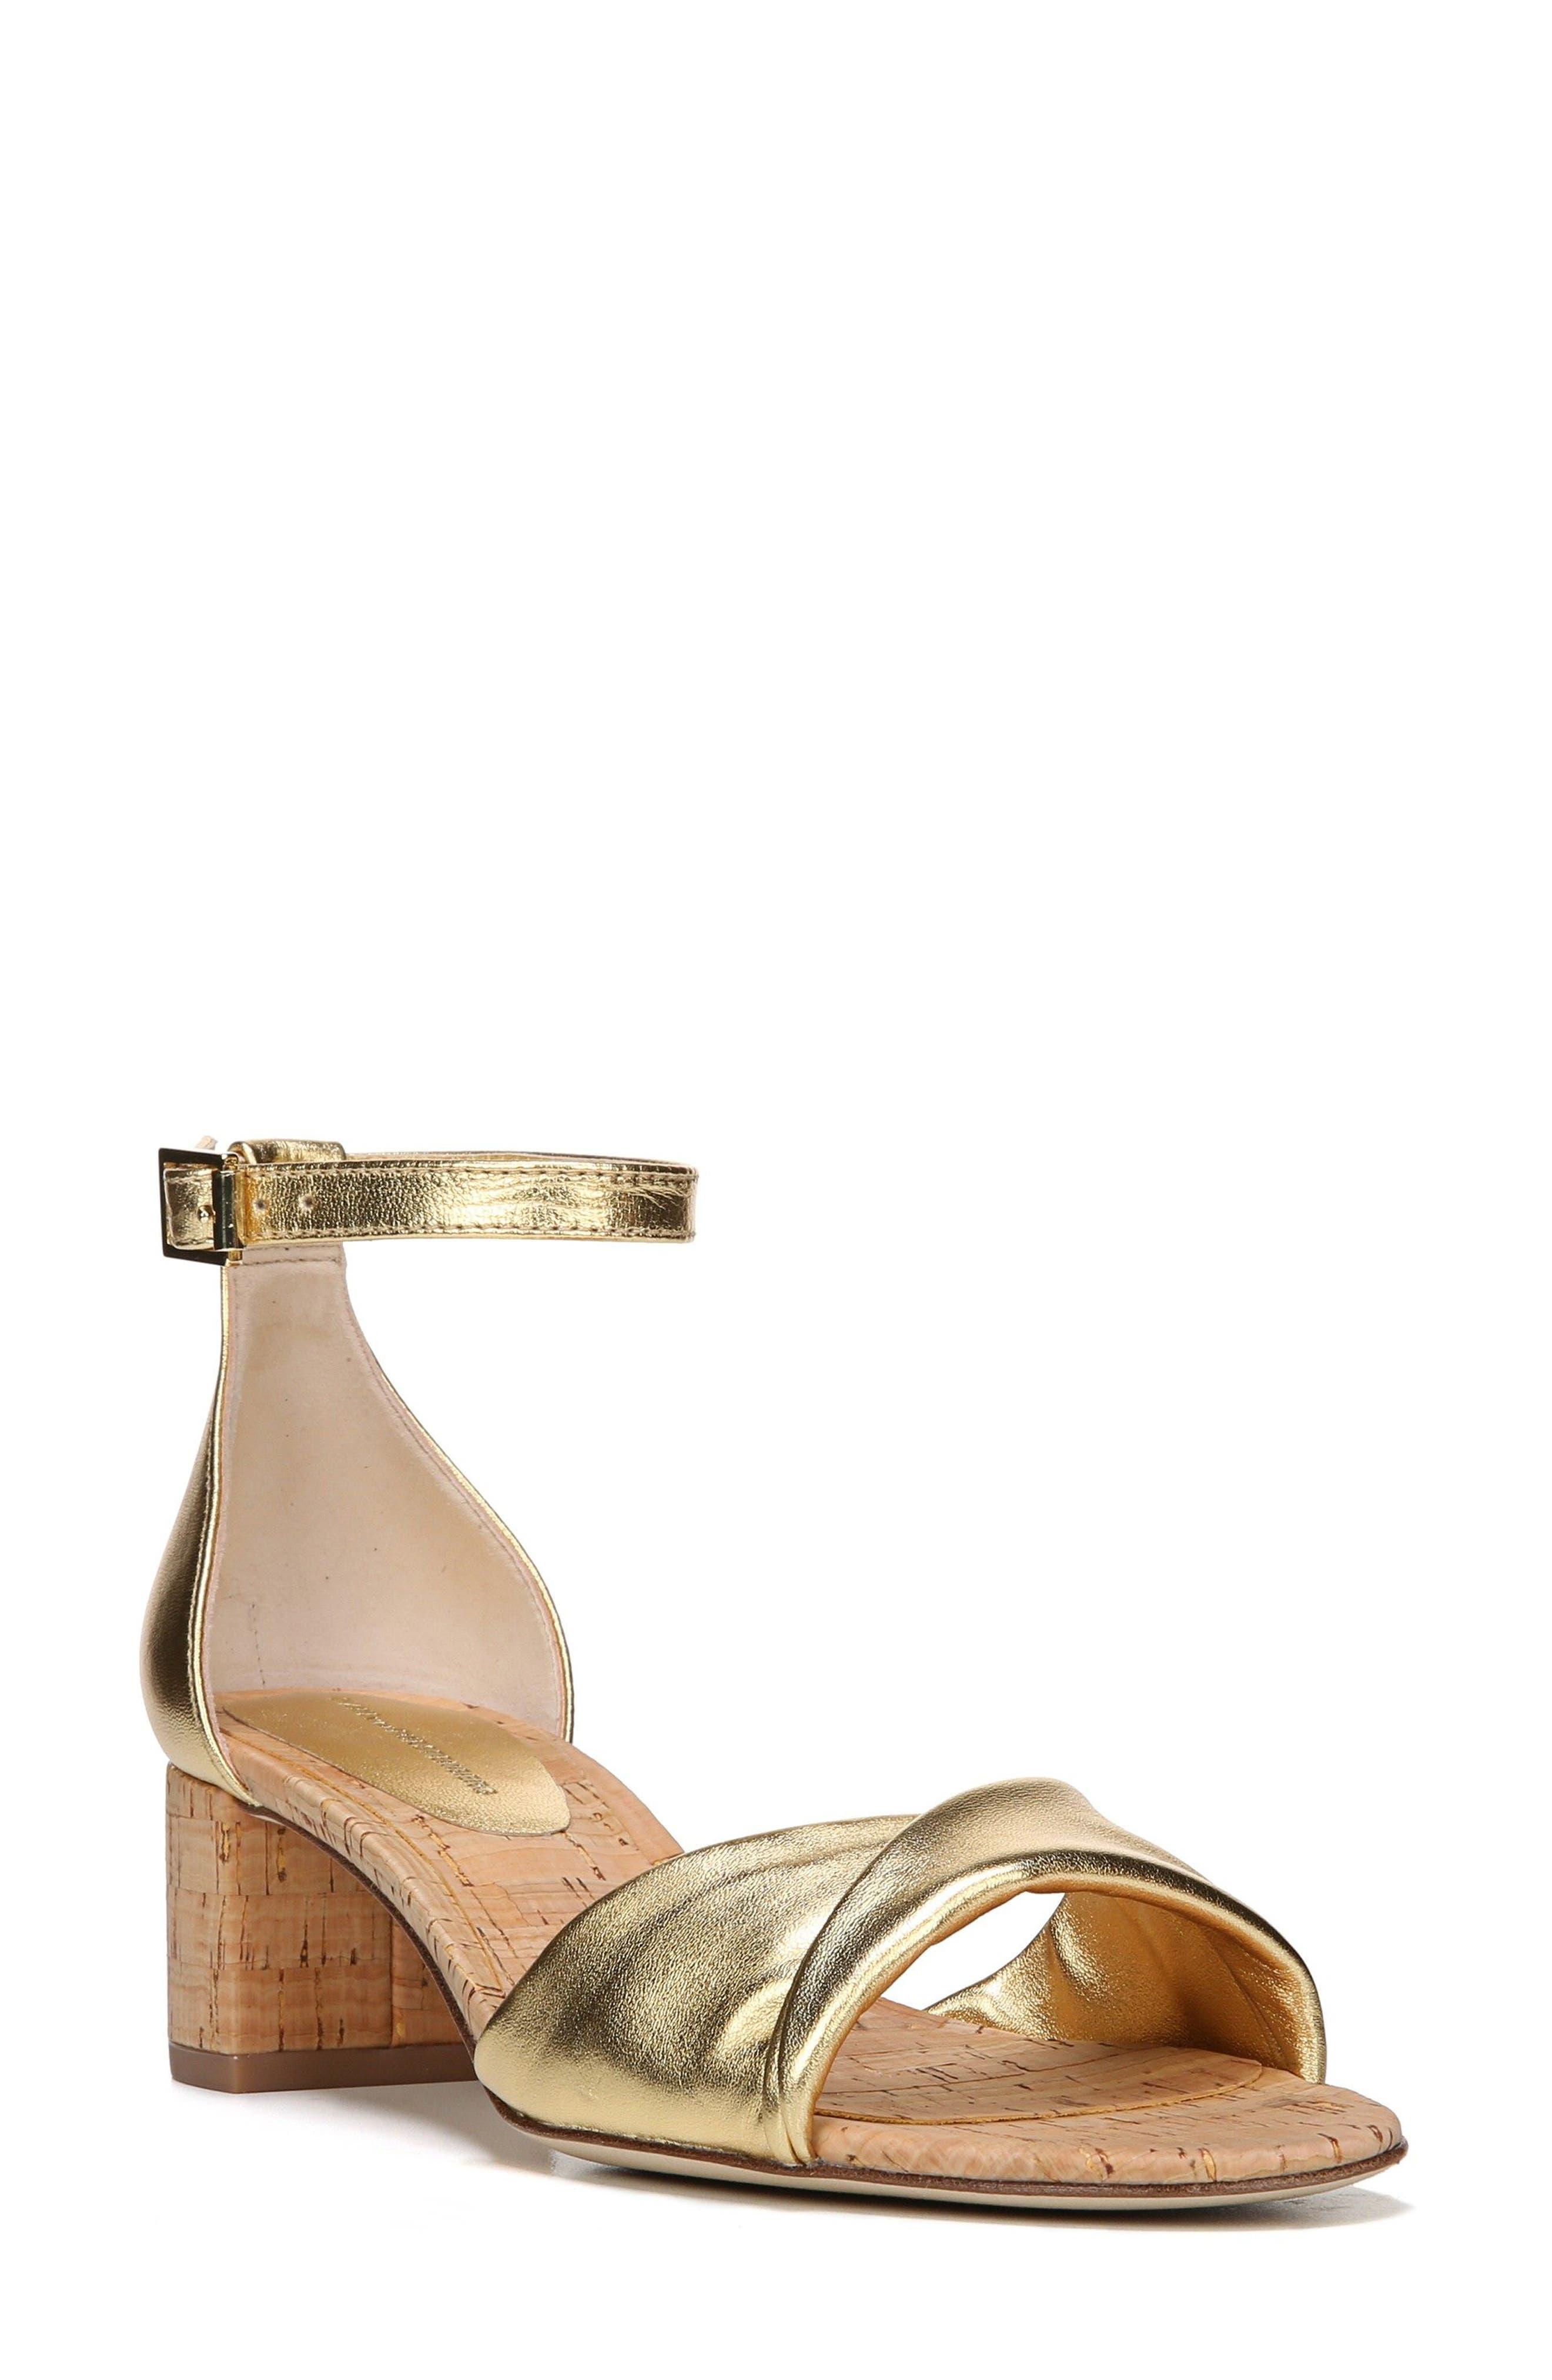 DIANE VON FURSTENBERG Florence Ankle Strap Sandal